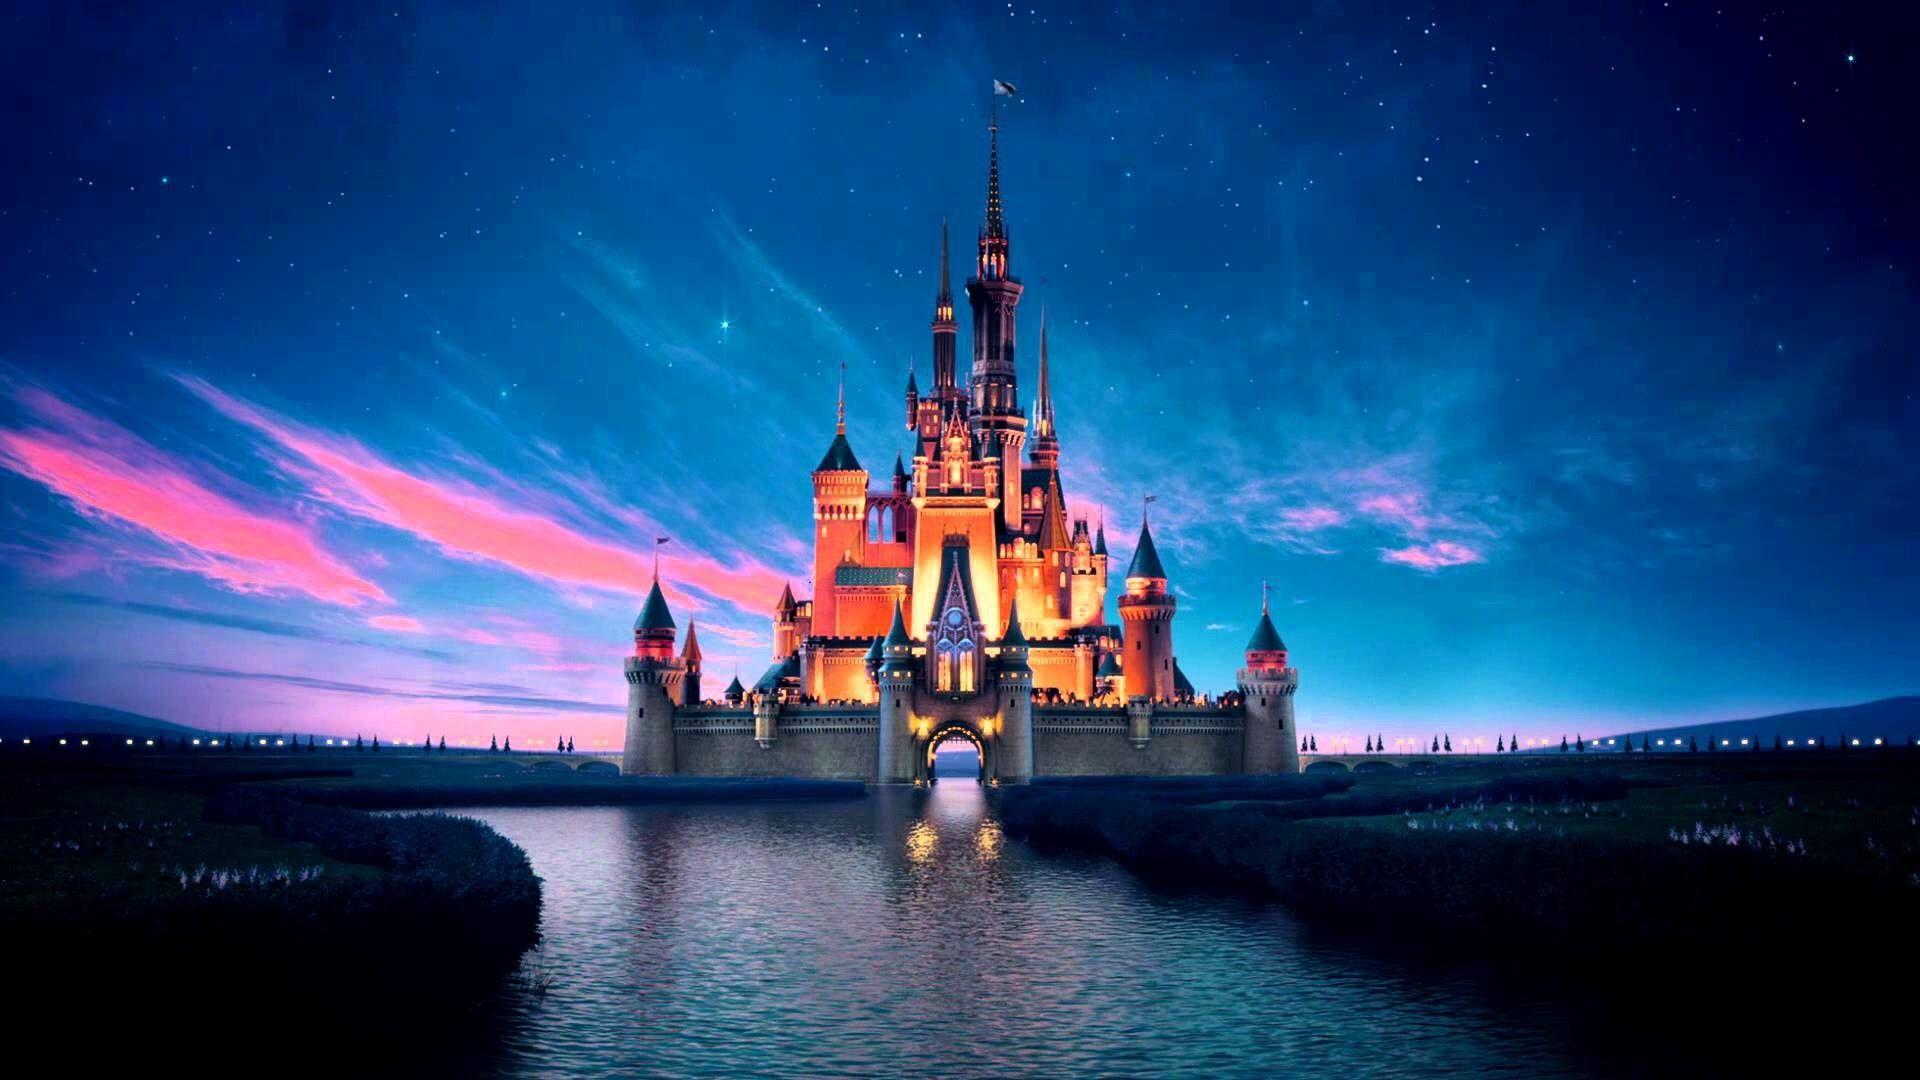 Disneyland Castle Wallpapers Hd Wallpaper Cave